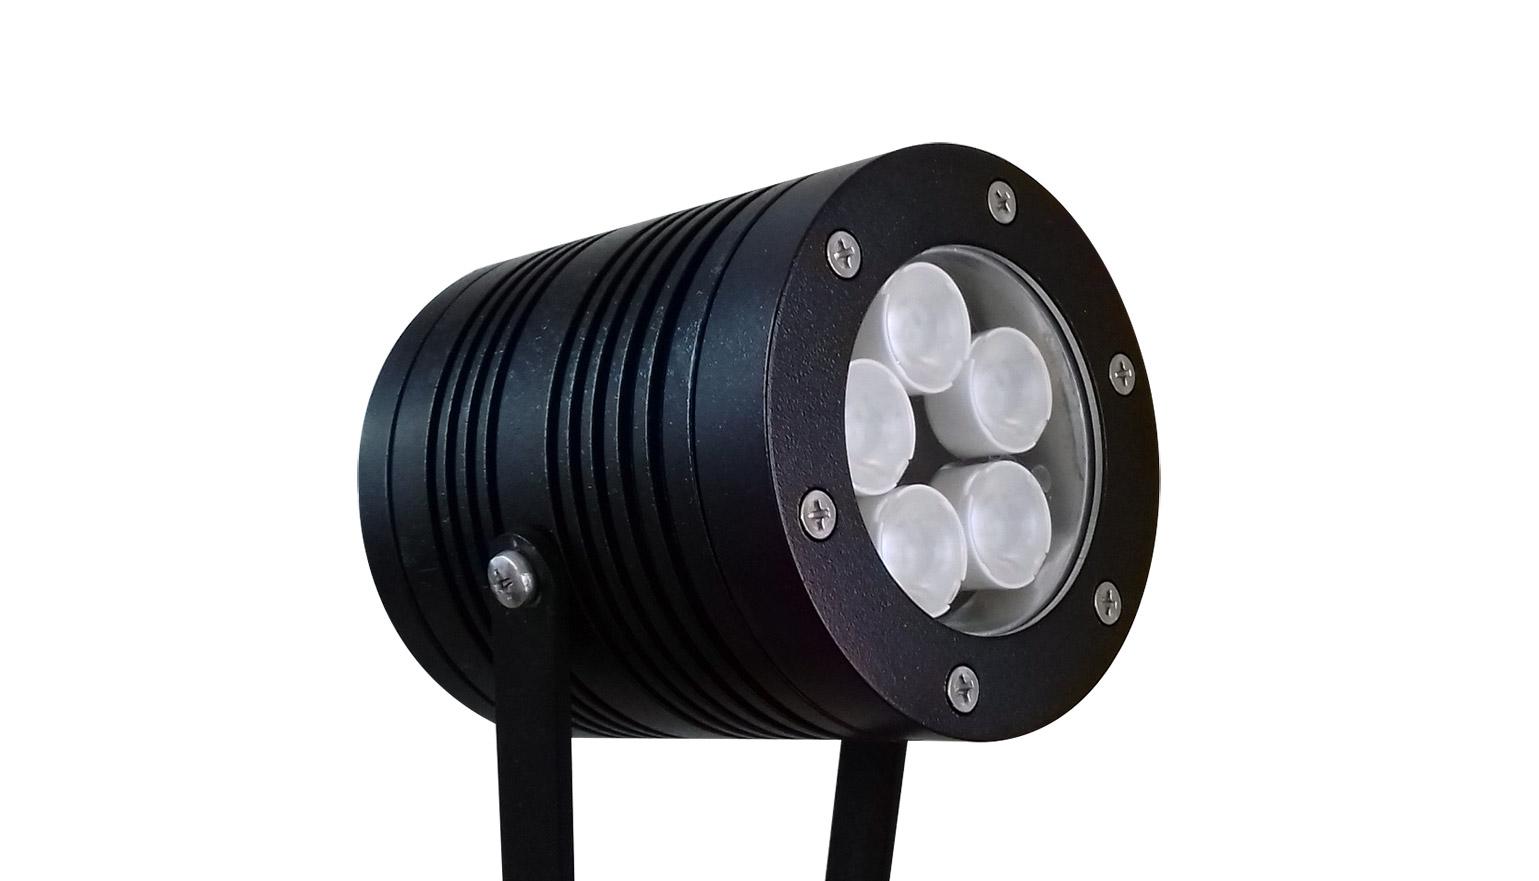 Finco de jardim LED 15Watts